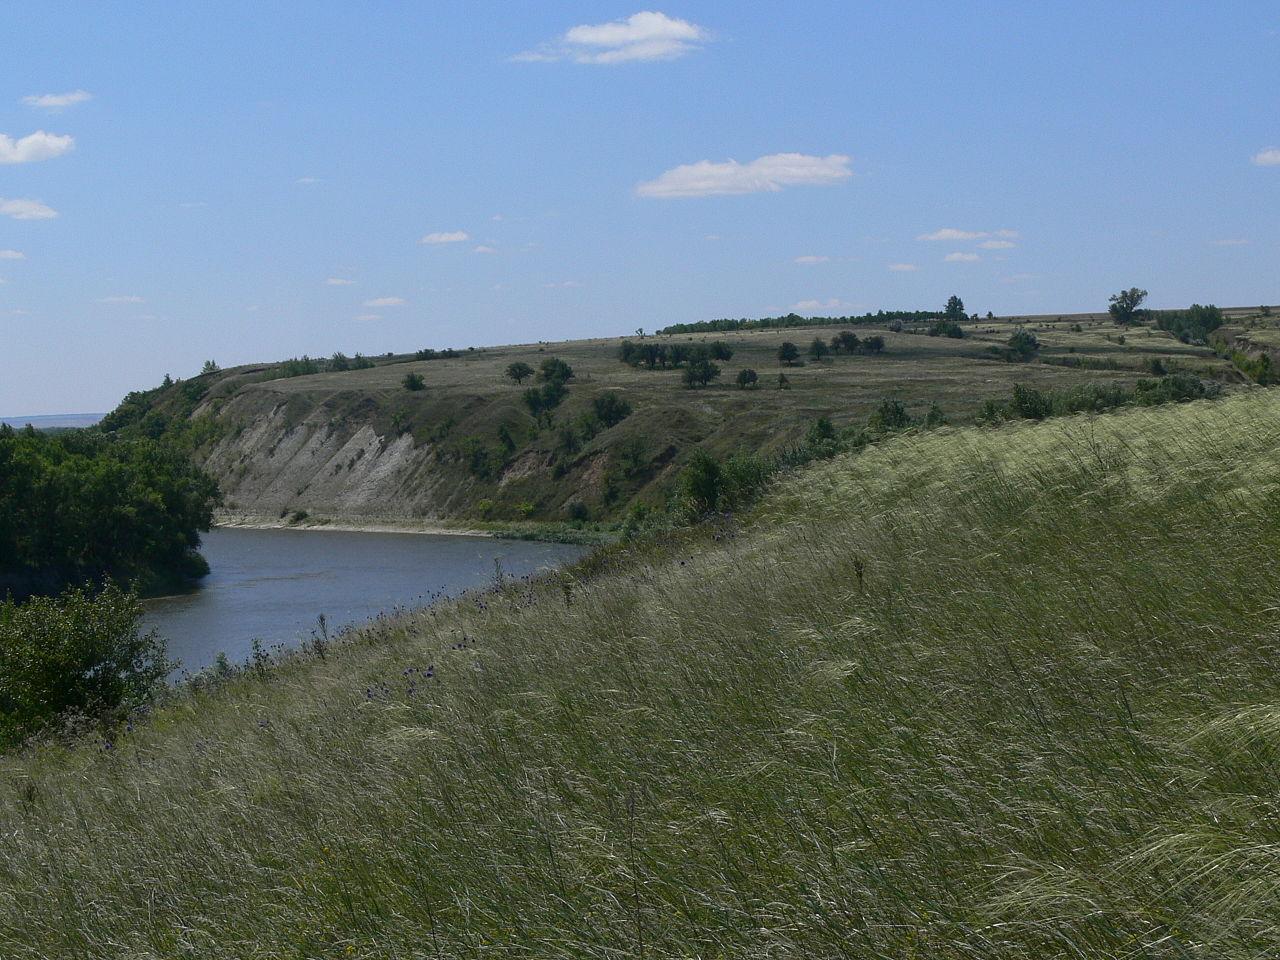 1280px-Khopyor_River_(Nizhnehopersky_Nature_Park)_001.jpg